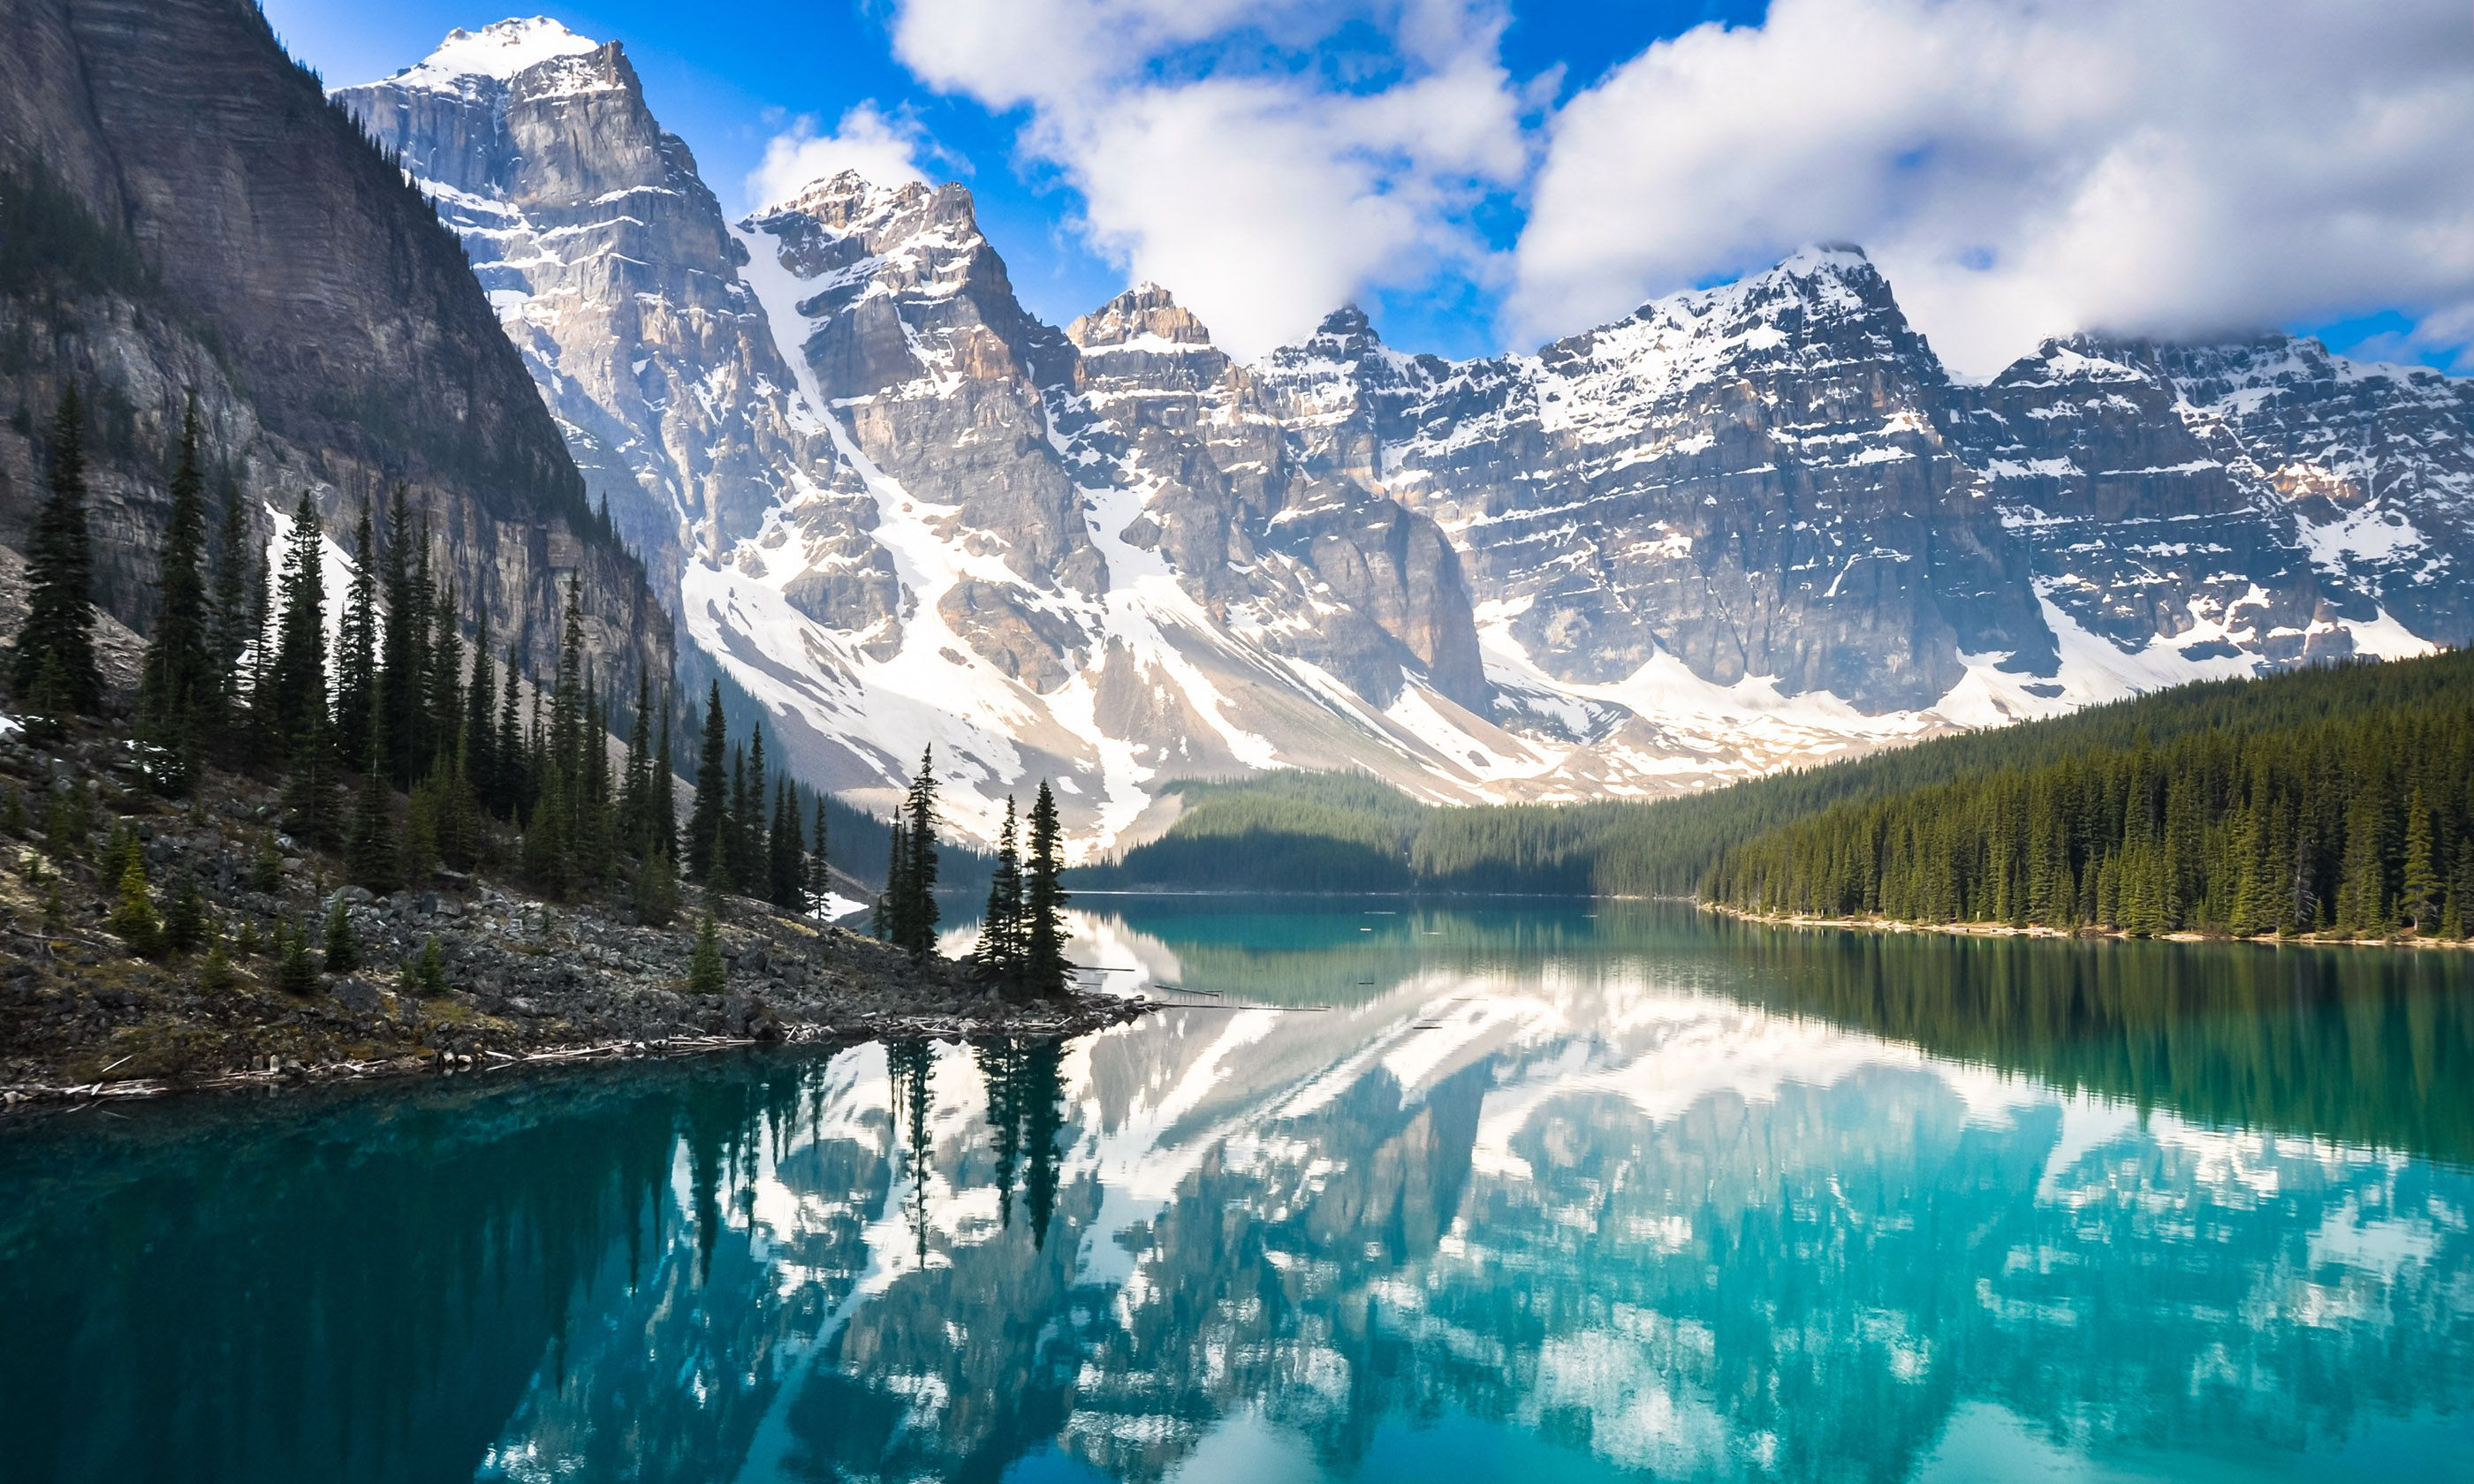 Marine Lake, Rocky Mountains (Shutterstock.com)